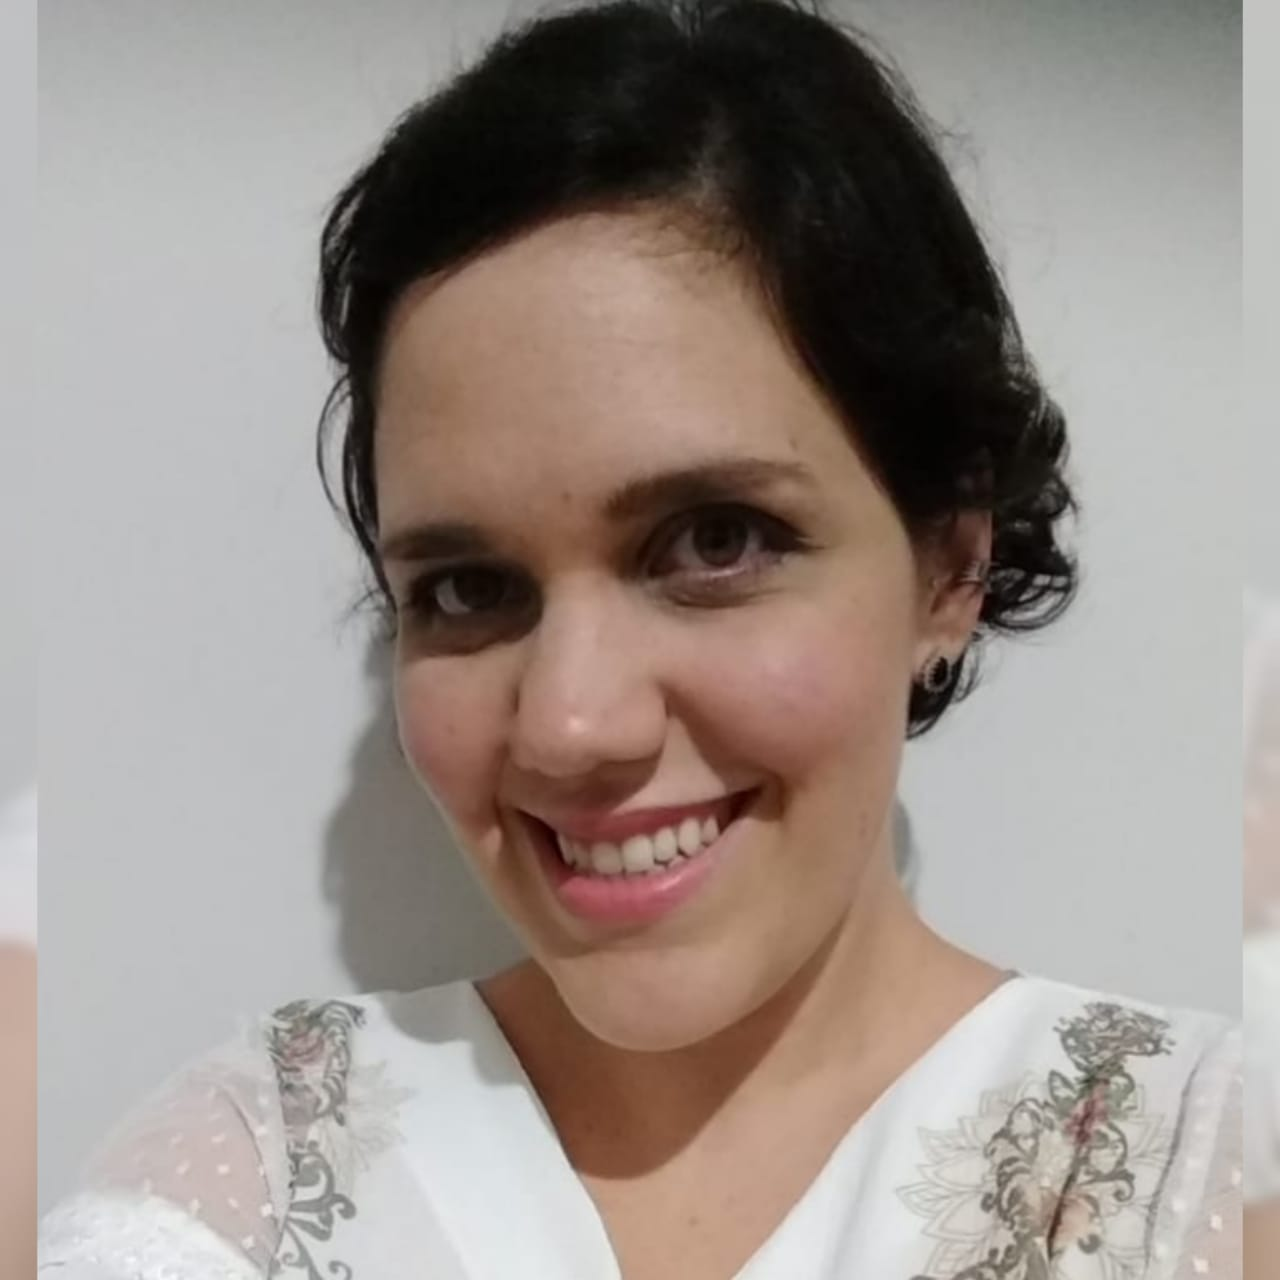 Paola Cristine Guimarães de Souza